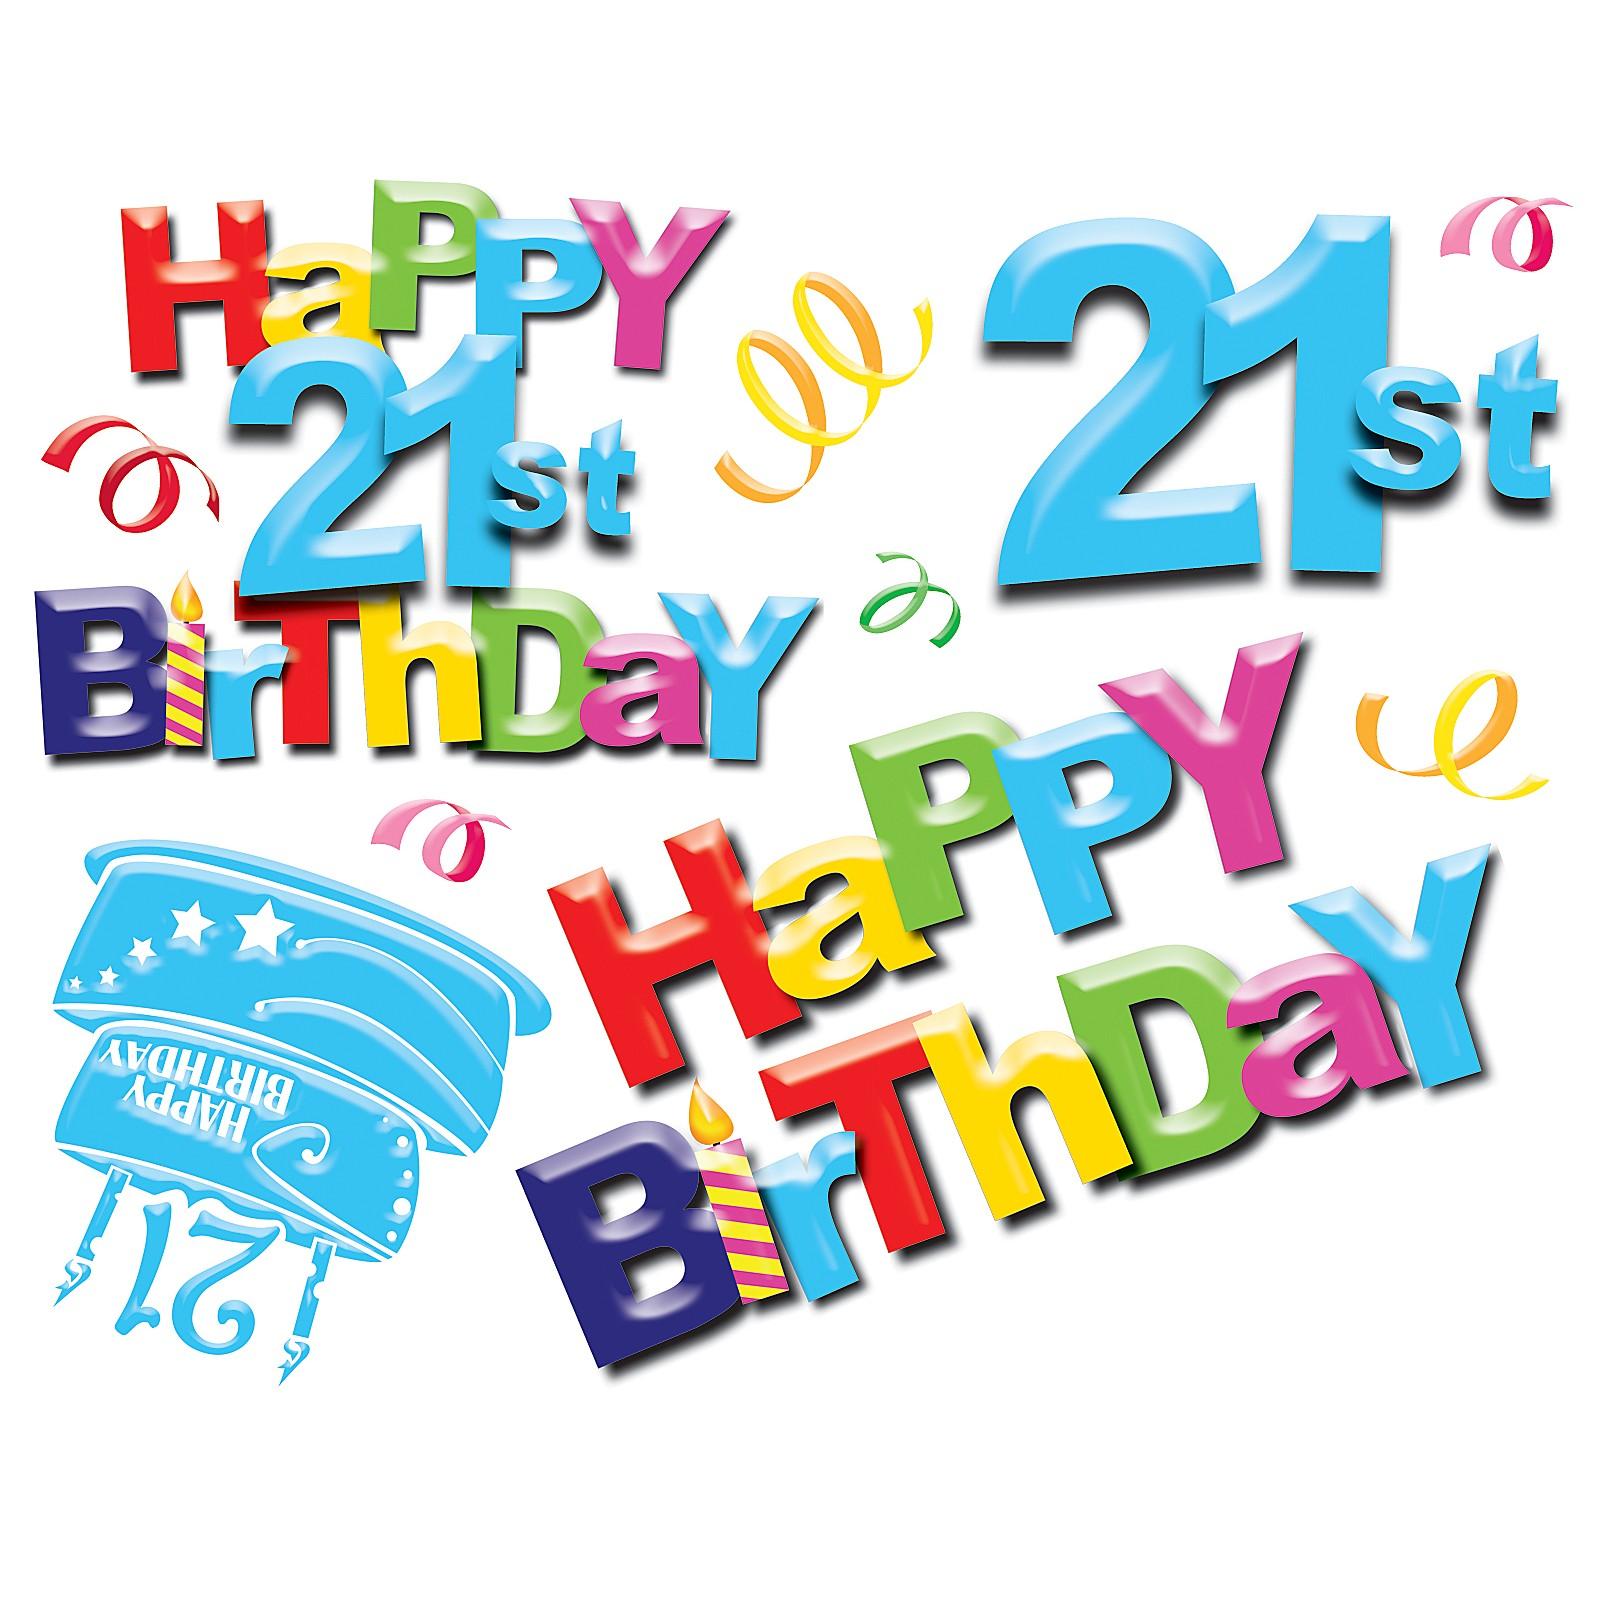 21st Birthday Clip Art - ClipArt Best